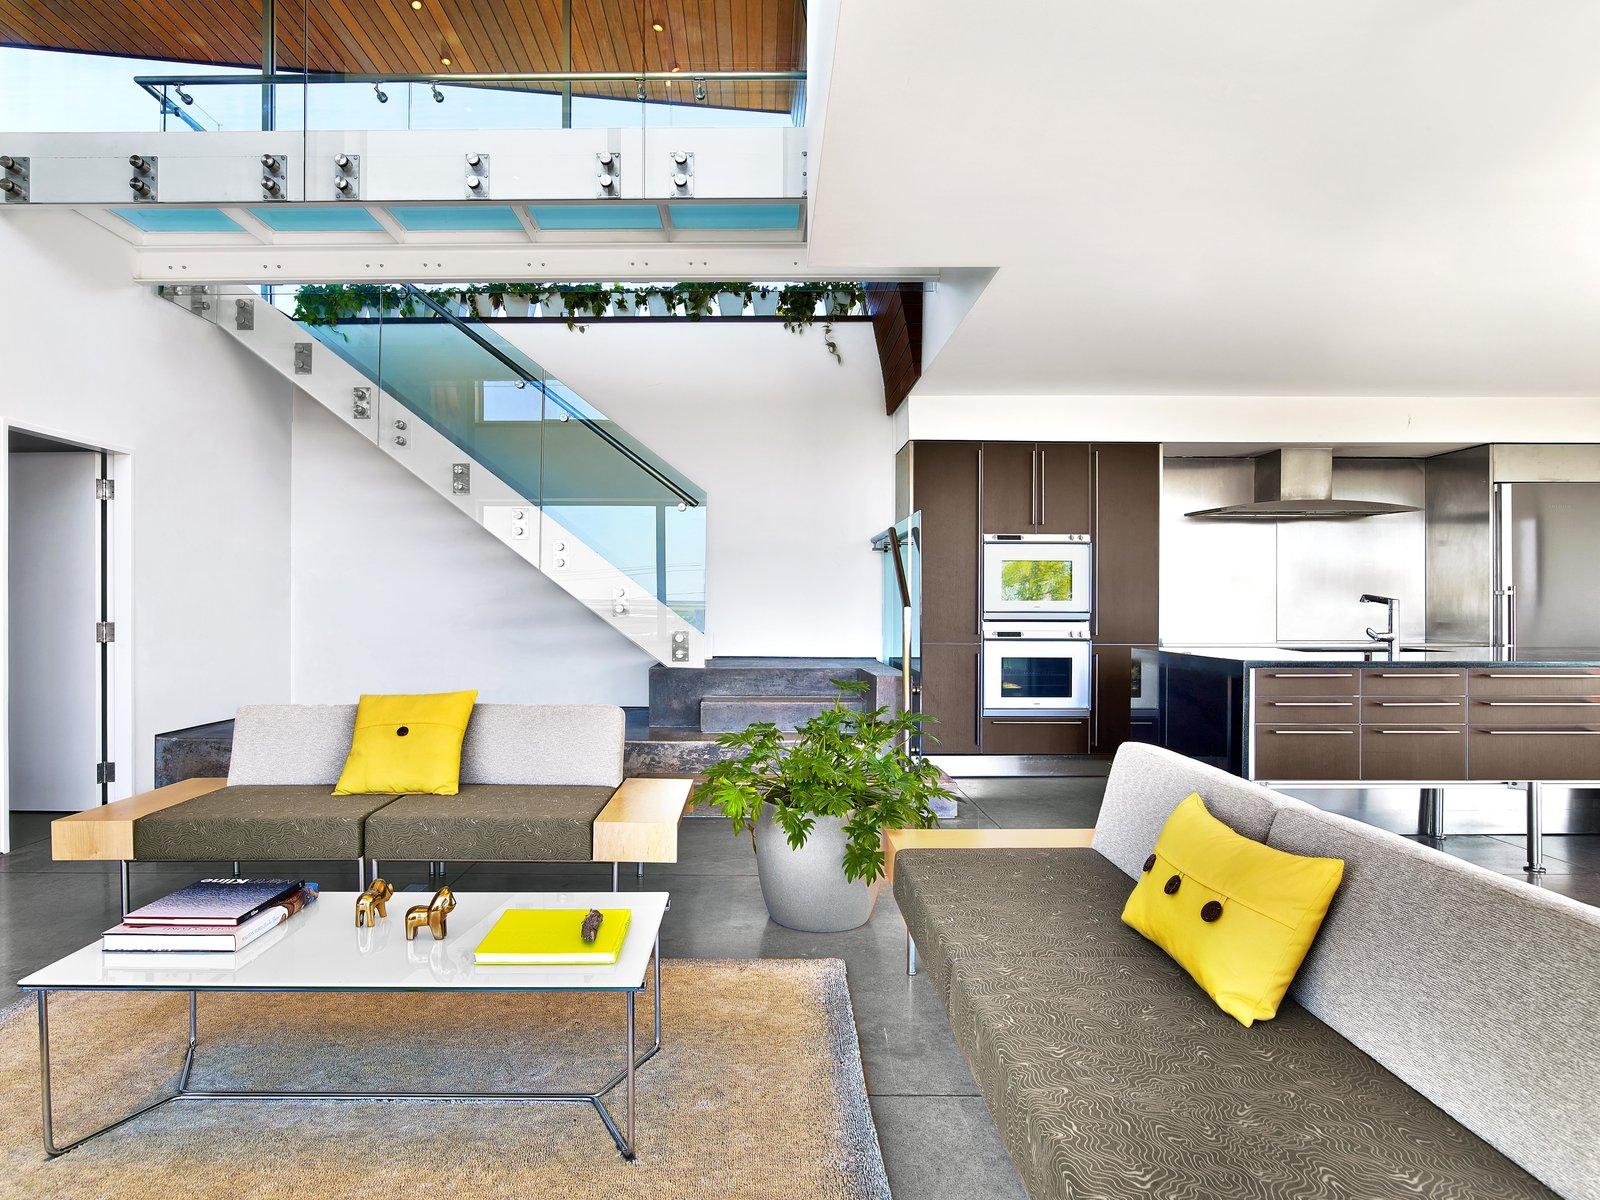 Living Room, Sofa, and Coffee Tables  Cape Cod - Beach House by Hariri & Hariri Architecture